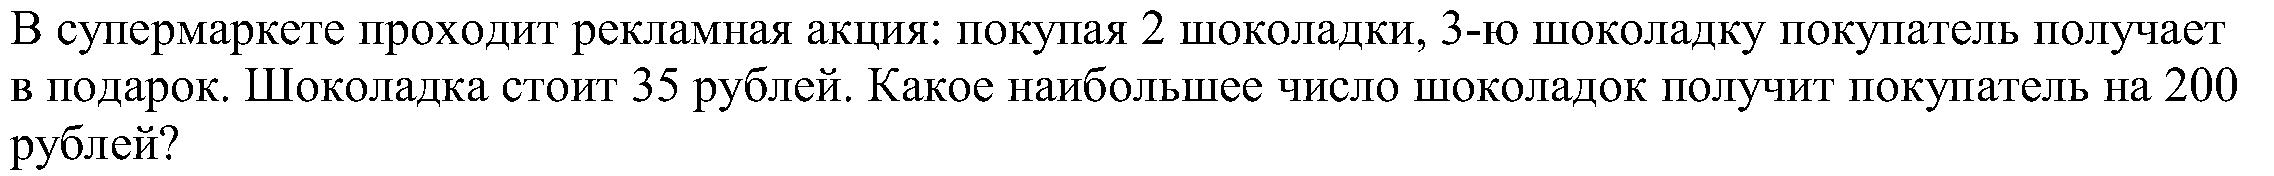 hello_html_m5f4d99d3.png